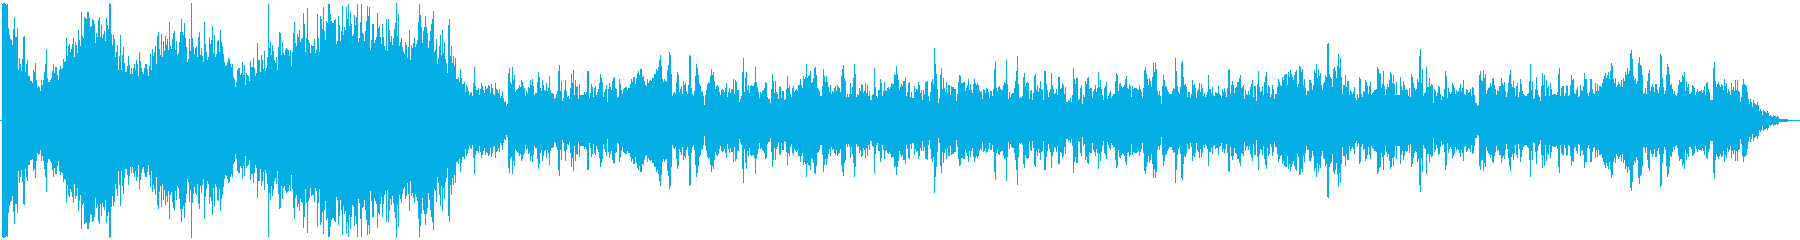 ATMO ABSTRACT Att...の再生済みの波形